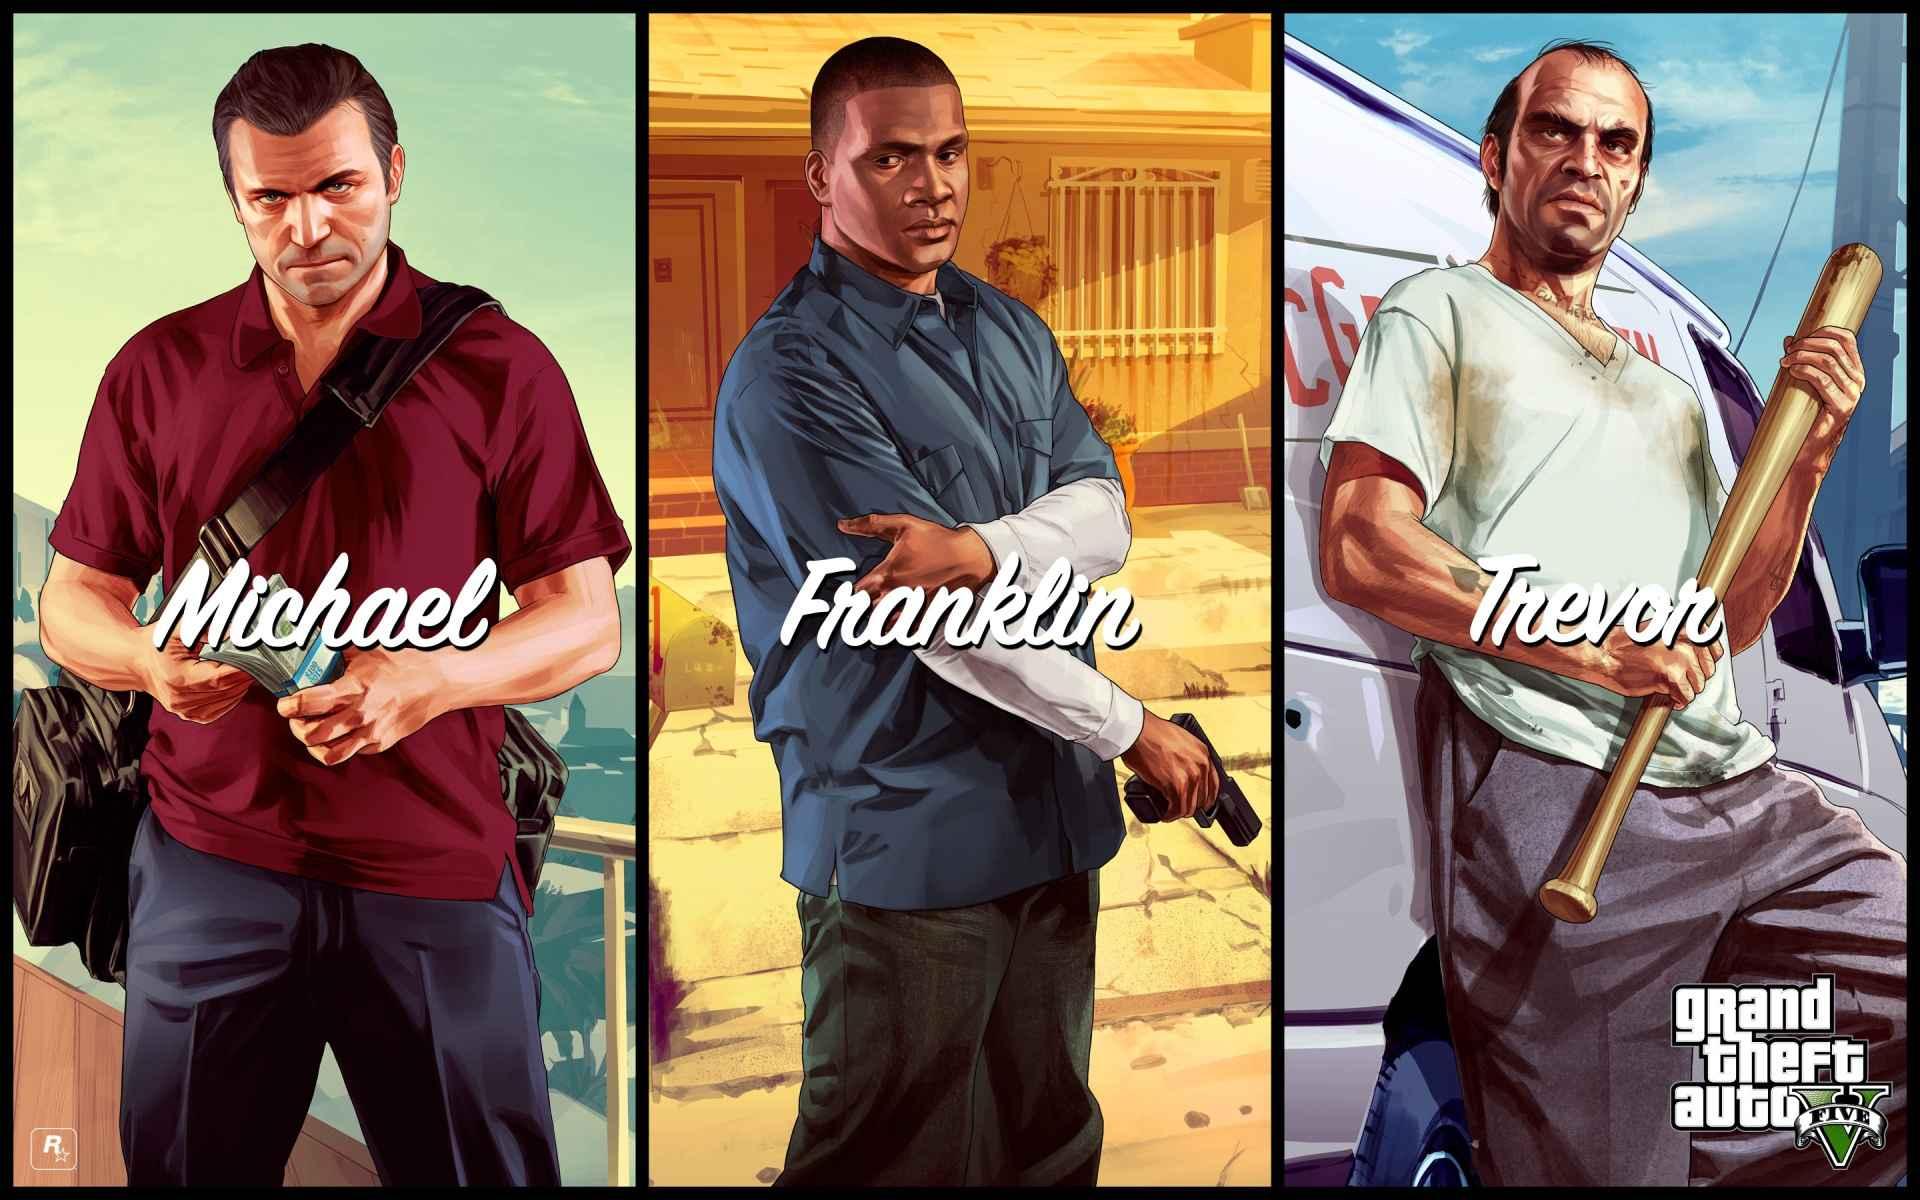 Game Grand Theft Auto V Wallpaper 065